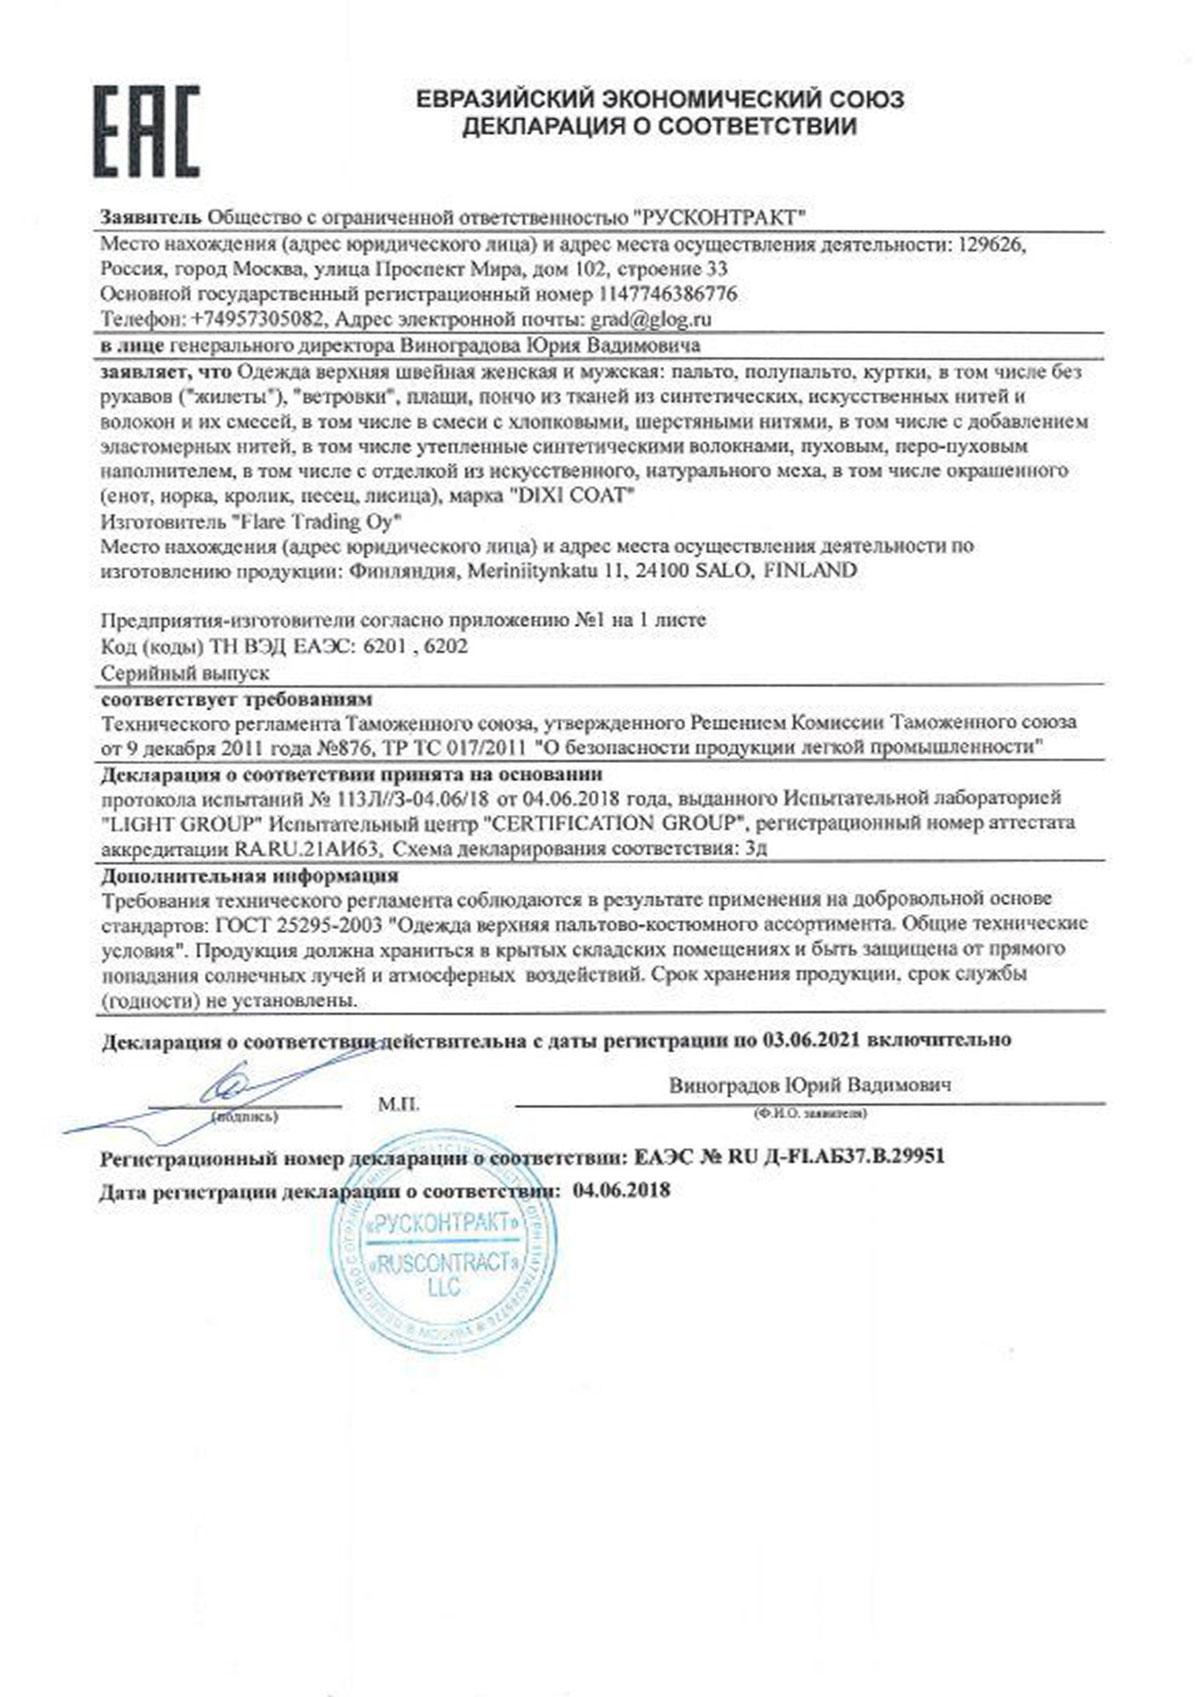 Декларация Dixi Coat